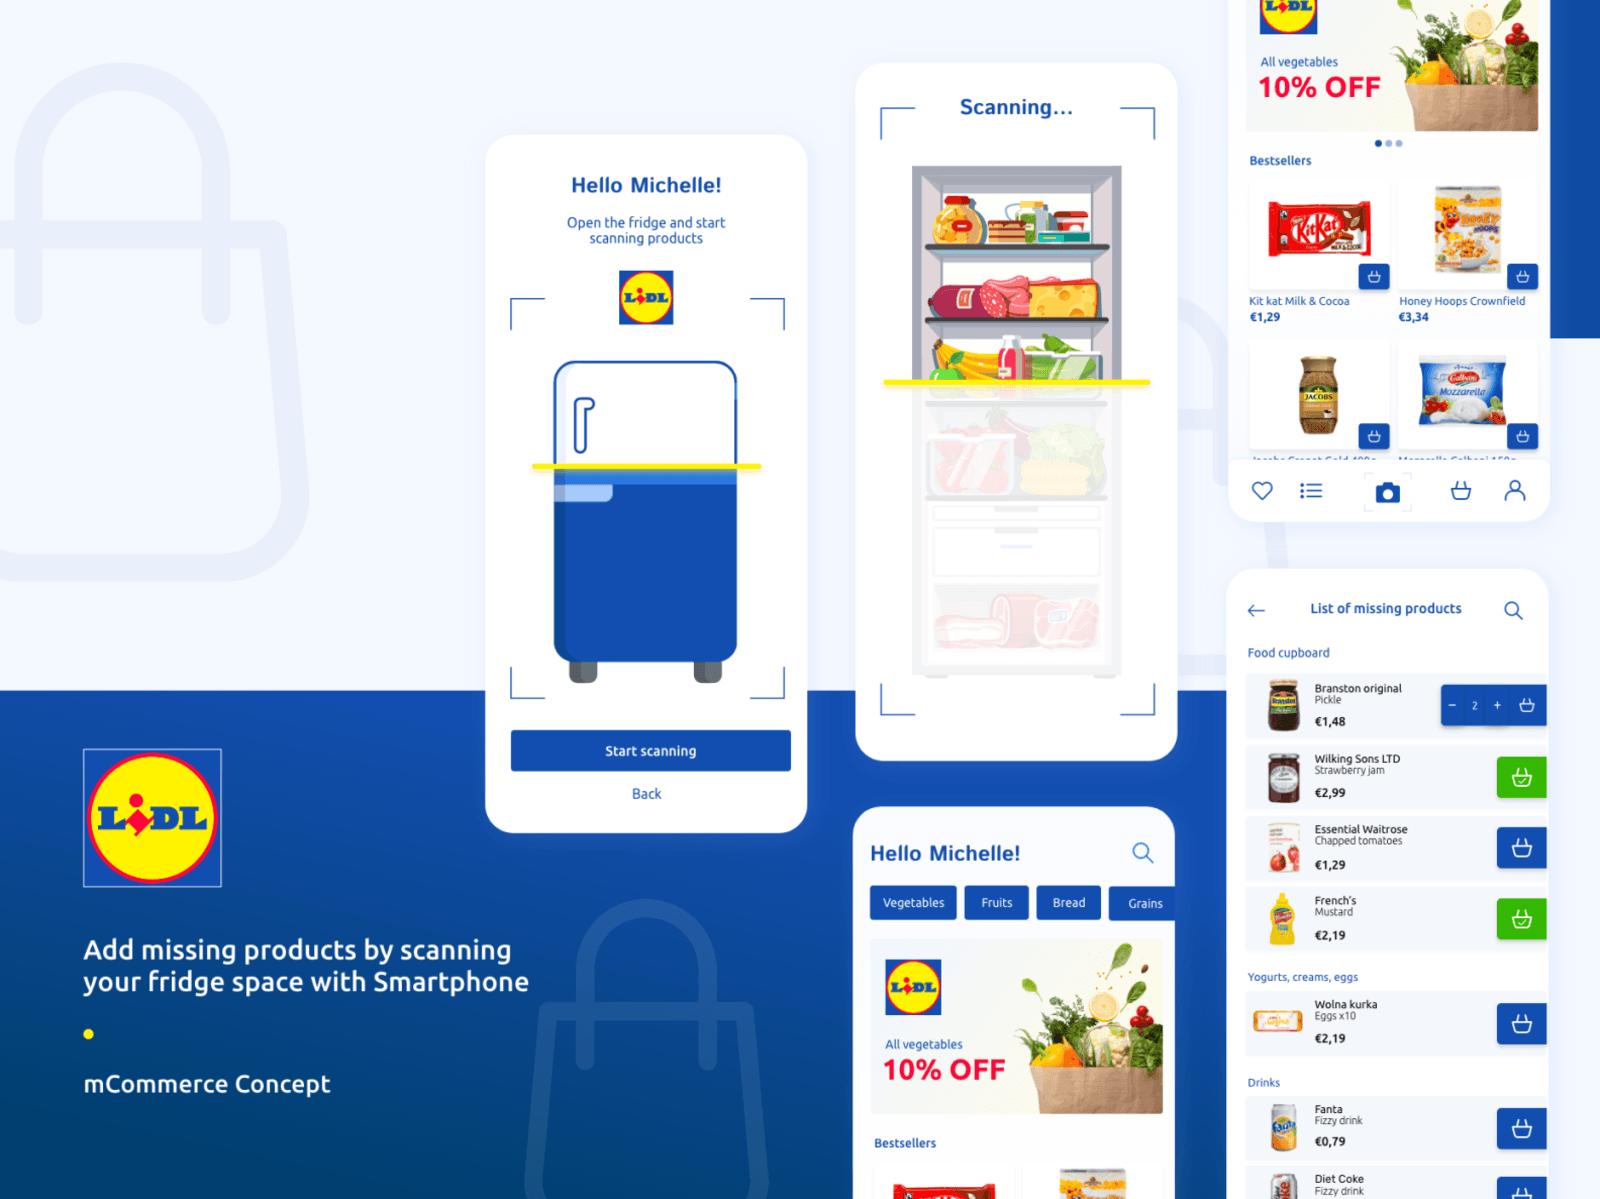 Mobile App concept with AI use for Lidl - mCommerce concept   Divante